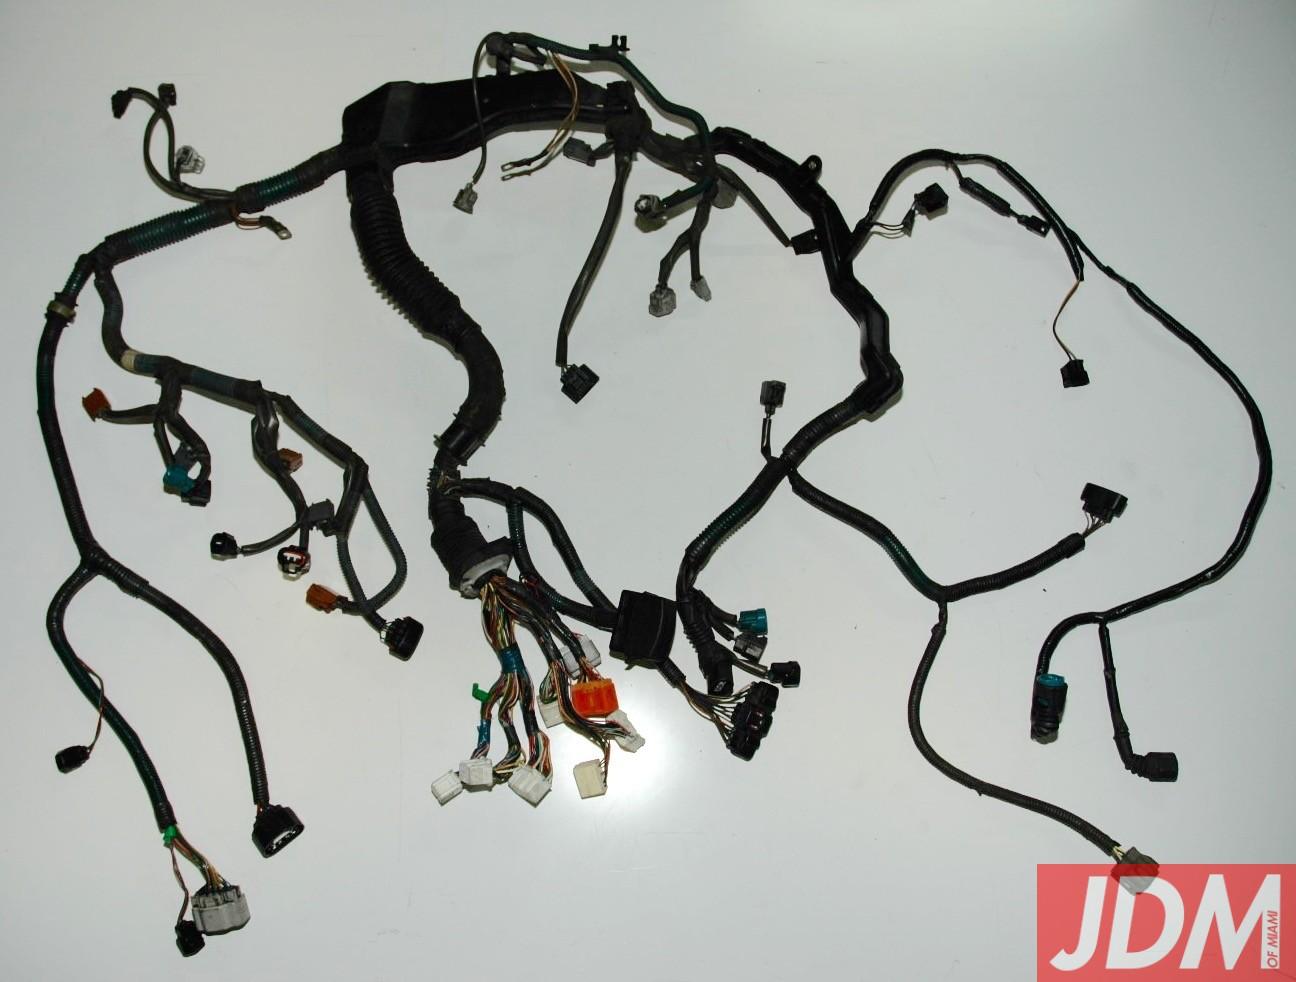 wiring engine at jdm of miami. Black Bedroom Furniture Sets. Home Design Ideas